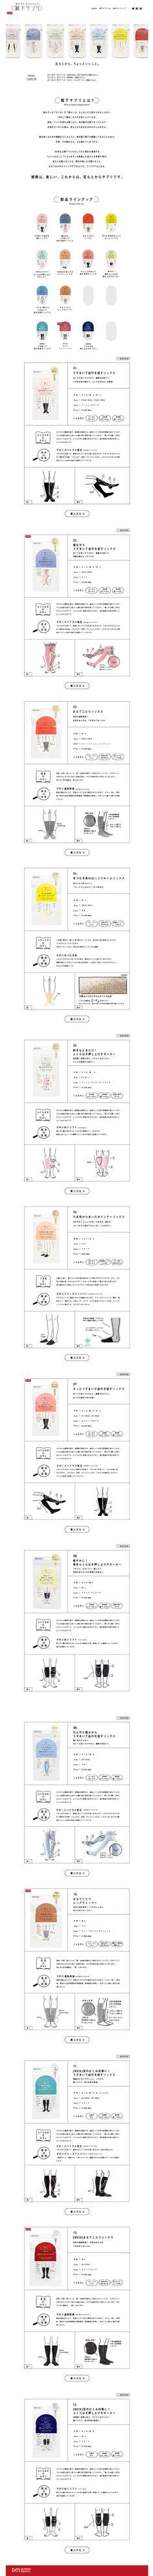 Brand Packaging, Packaging Design, Web Design Inspiration, Presentation Templates, Layout Design, Cool Designs, Bullet Journal, Branding, Concept